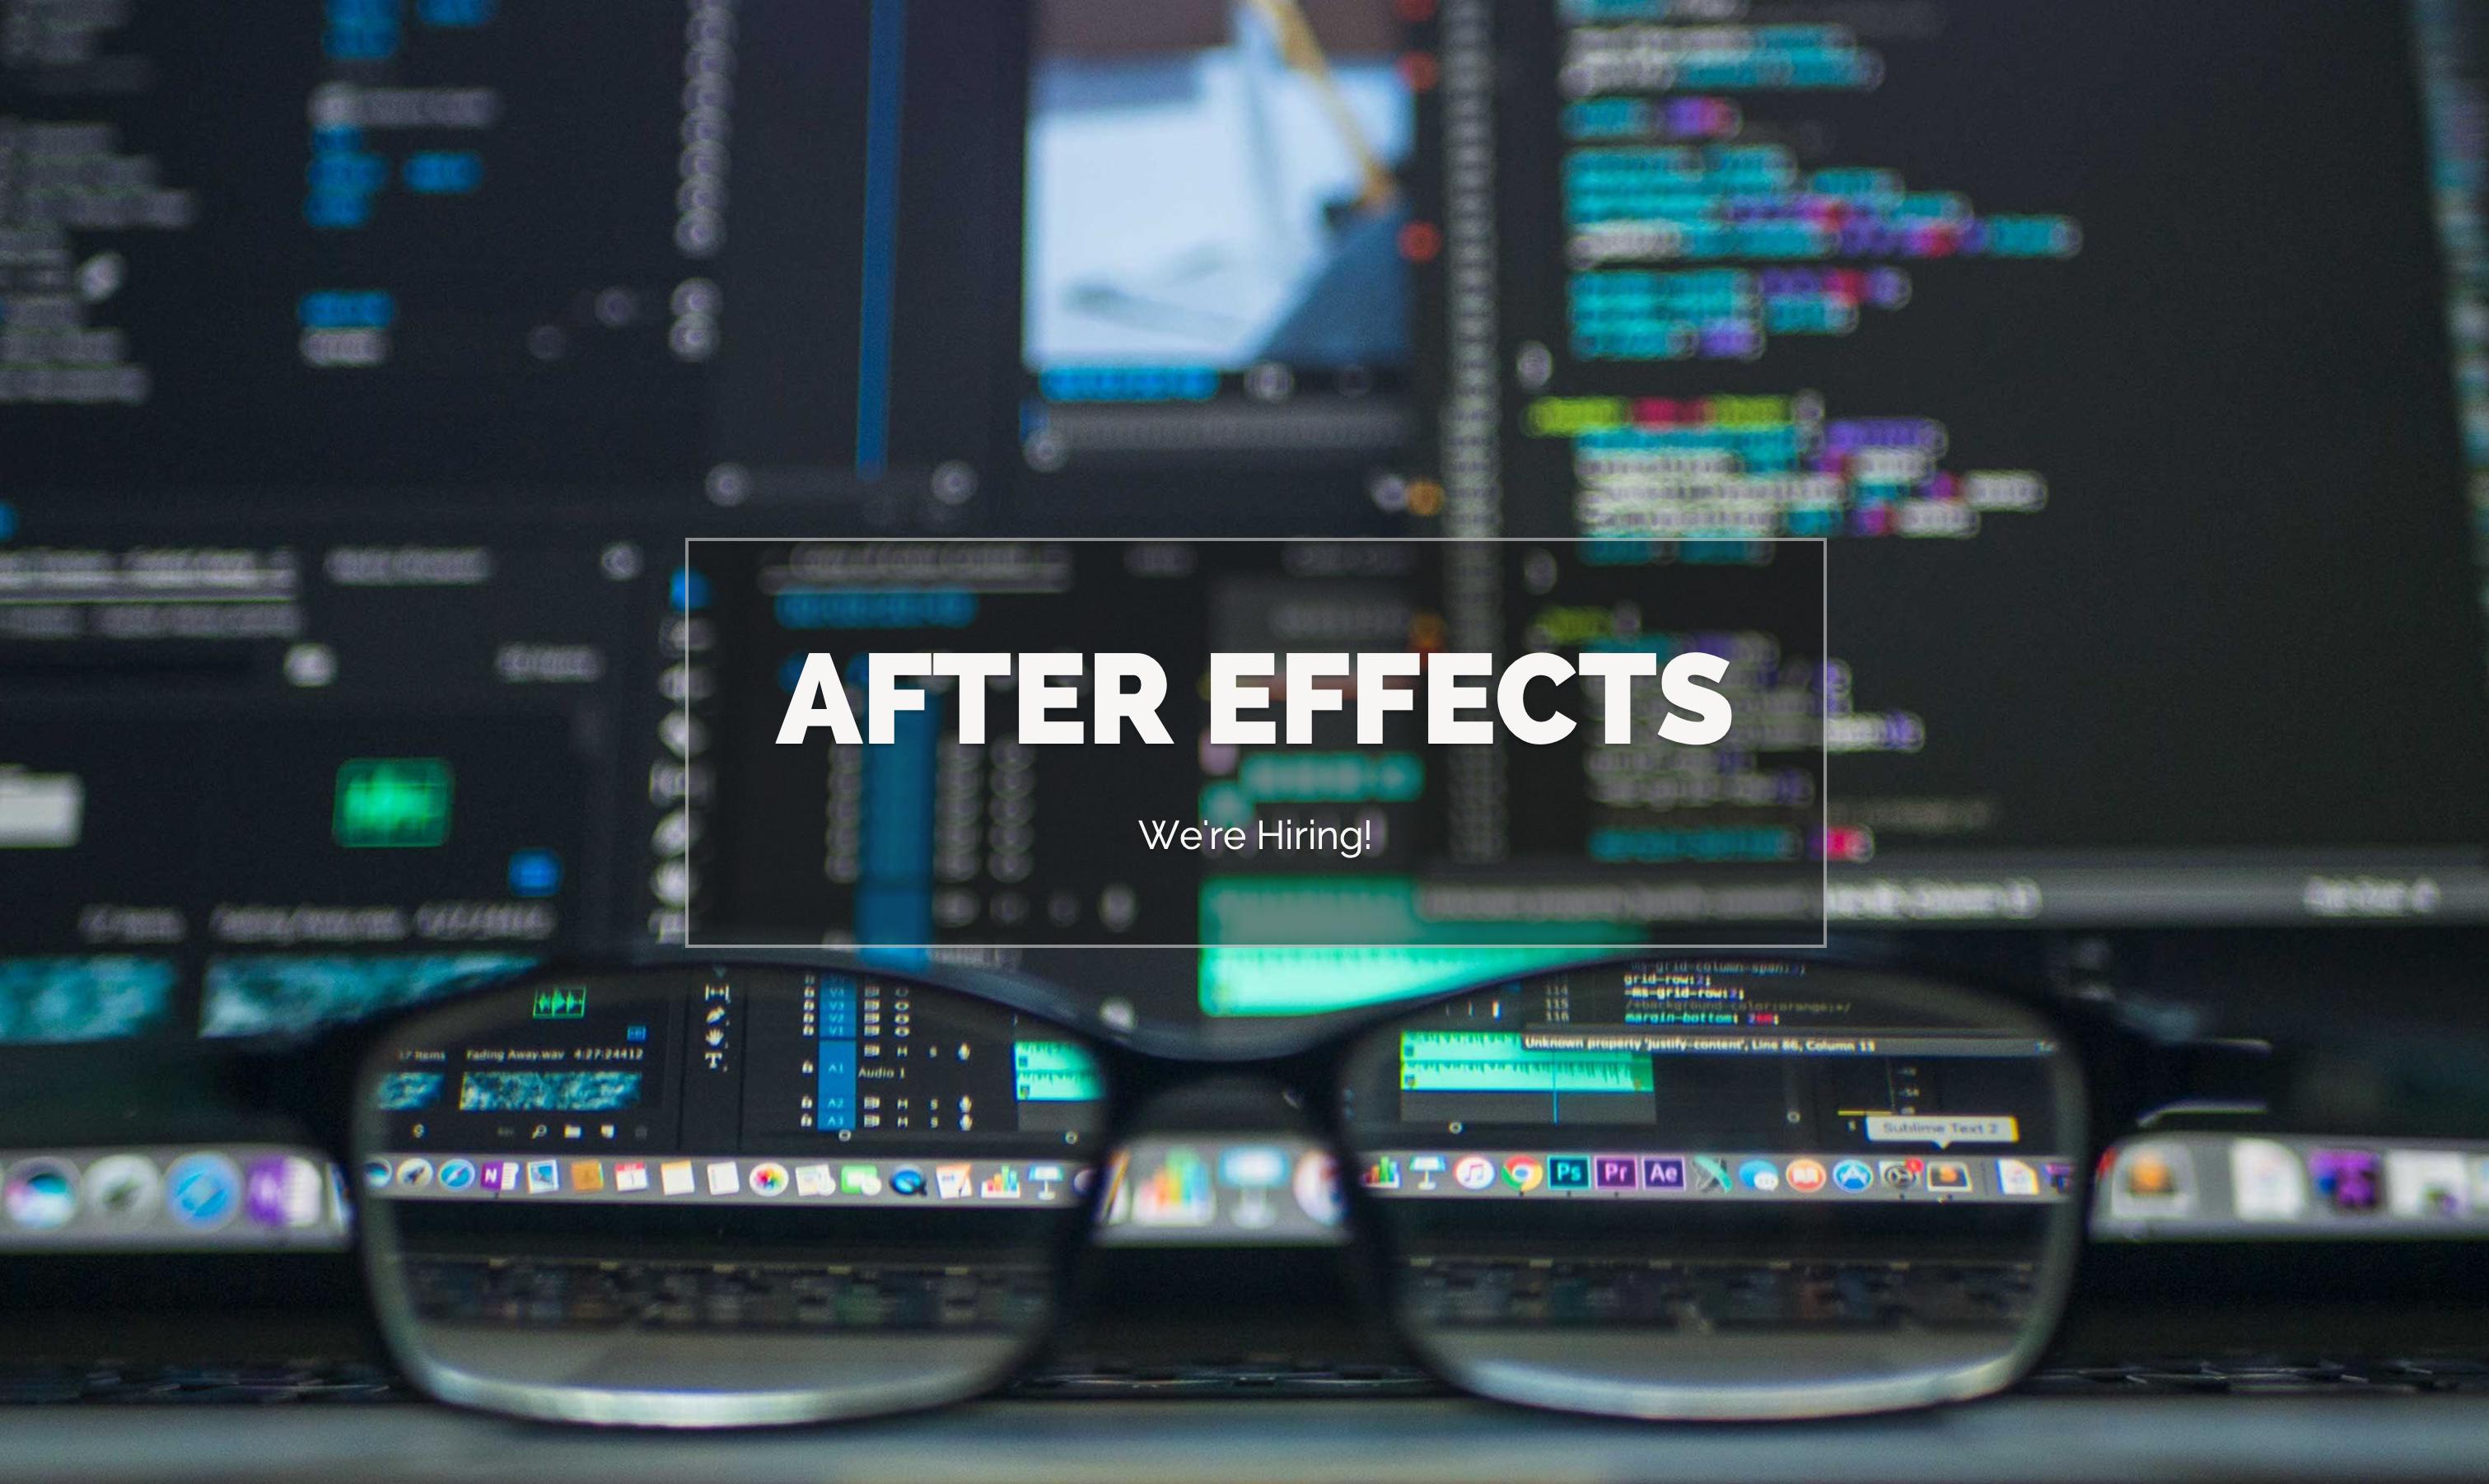 After Effects News 2018 December 30 2